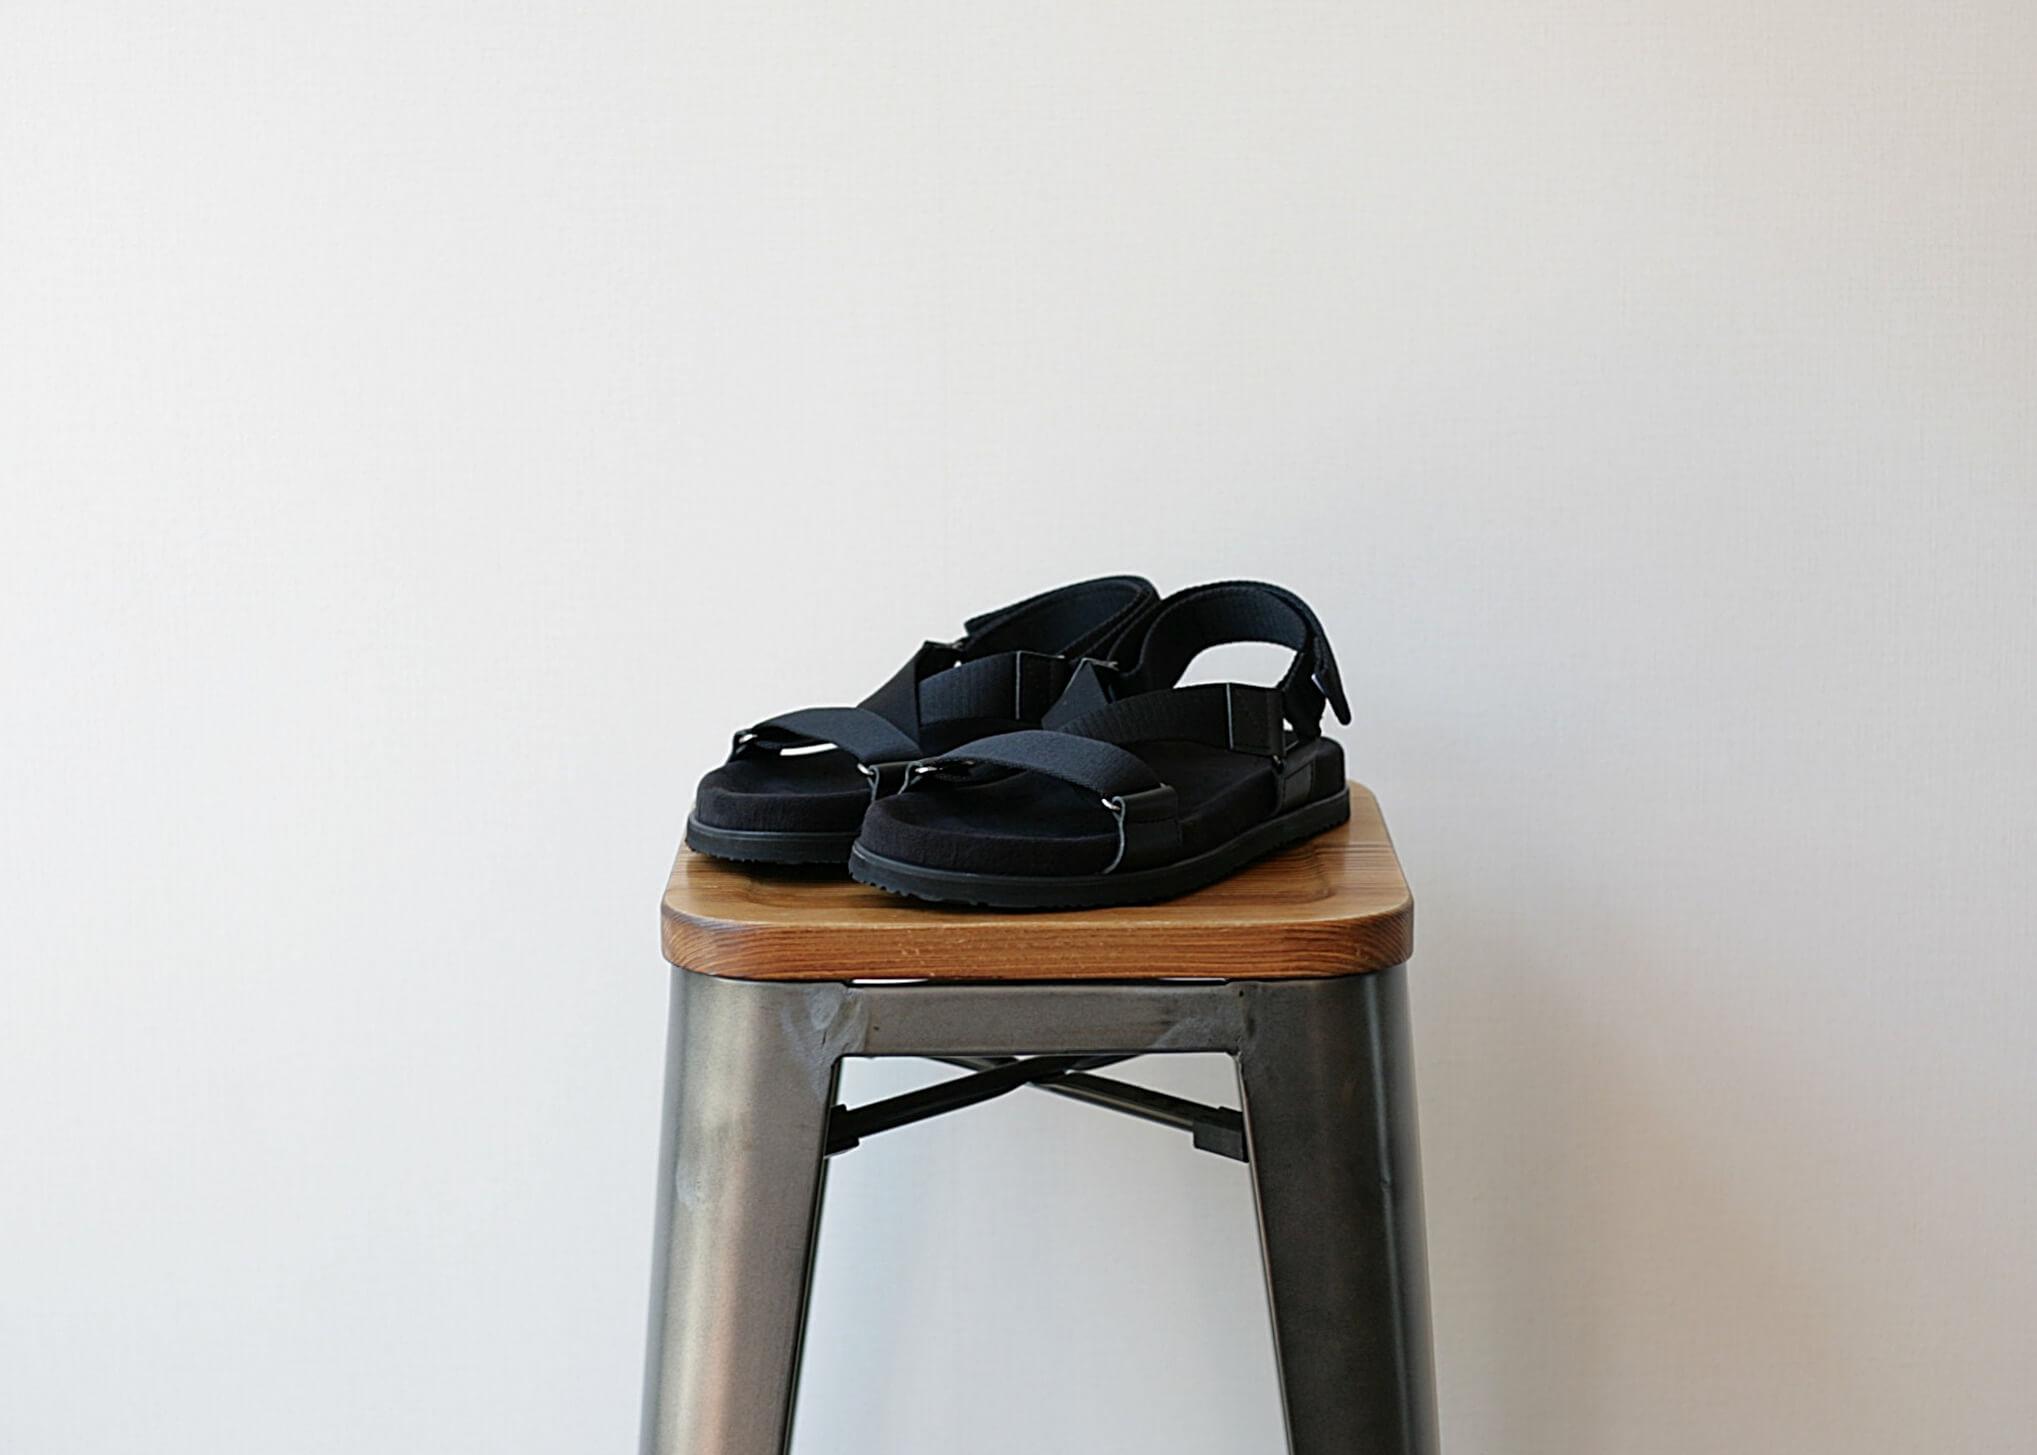 double foot wear becの斜めからの写真